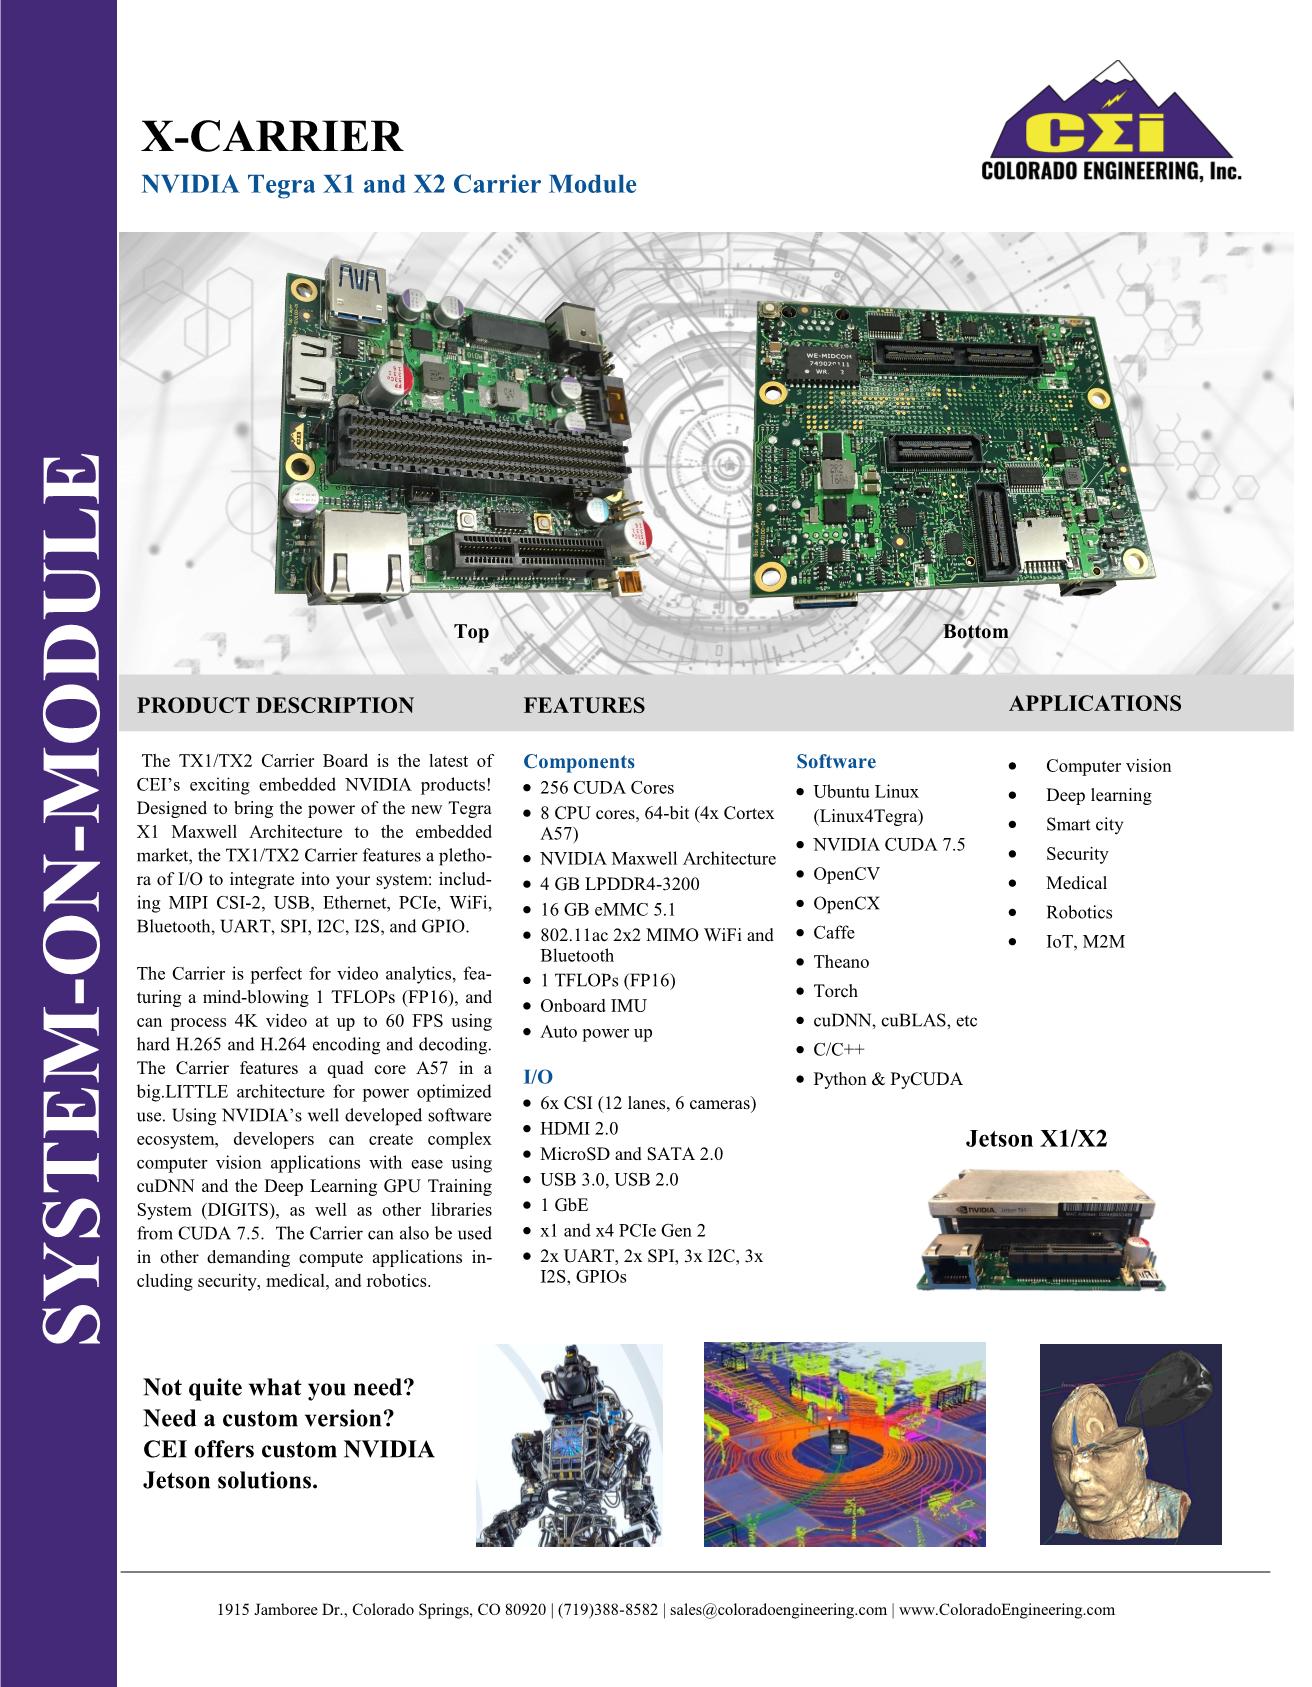 X-Carrier pdf - File Uploads - Colorado Engineering - EngineerZone